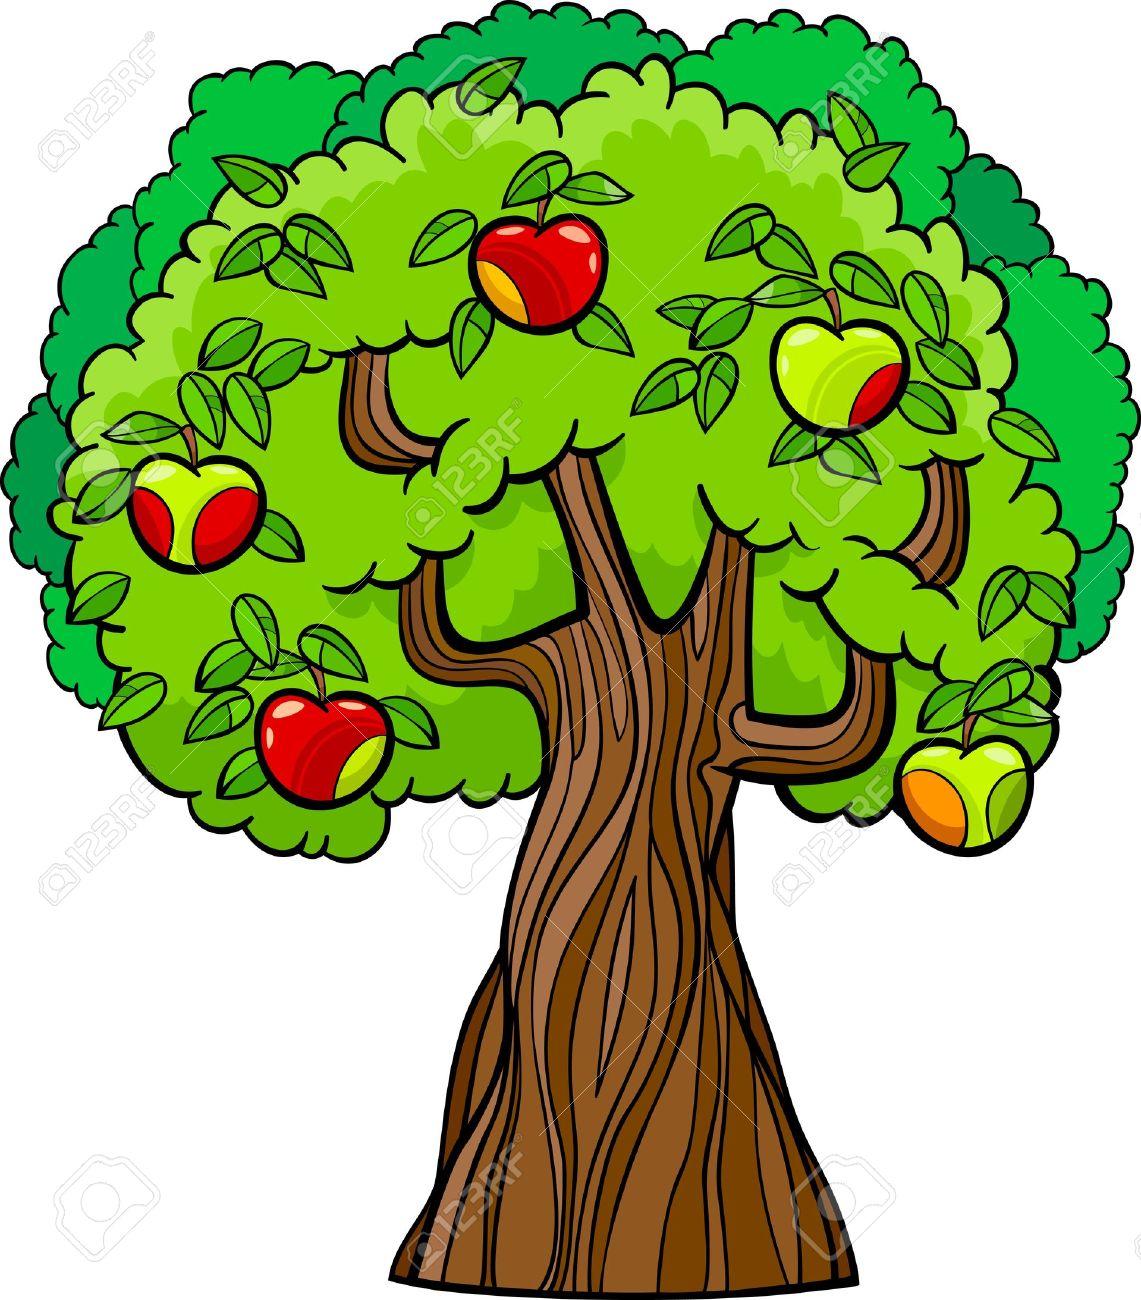 Cartoon Illustration Of Apple Tree With Juicy Apples Royalty Free ...